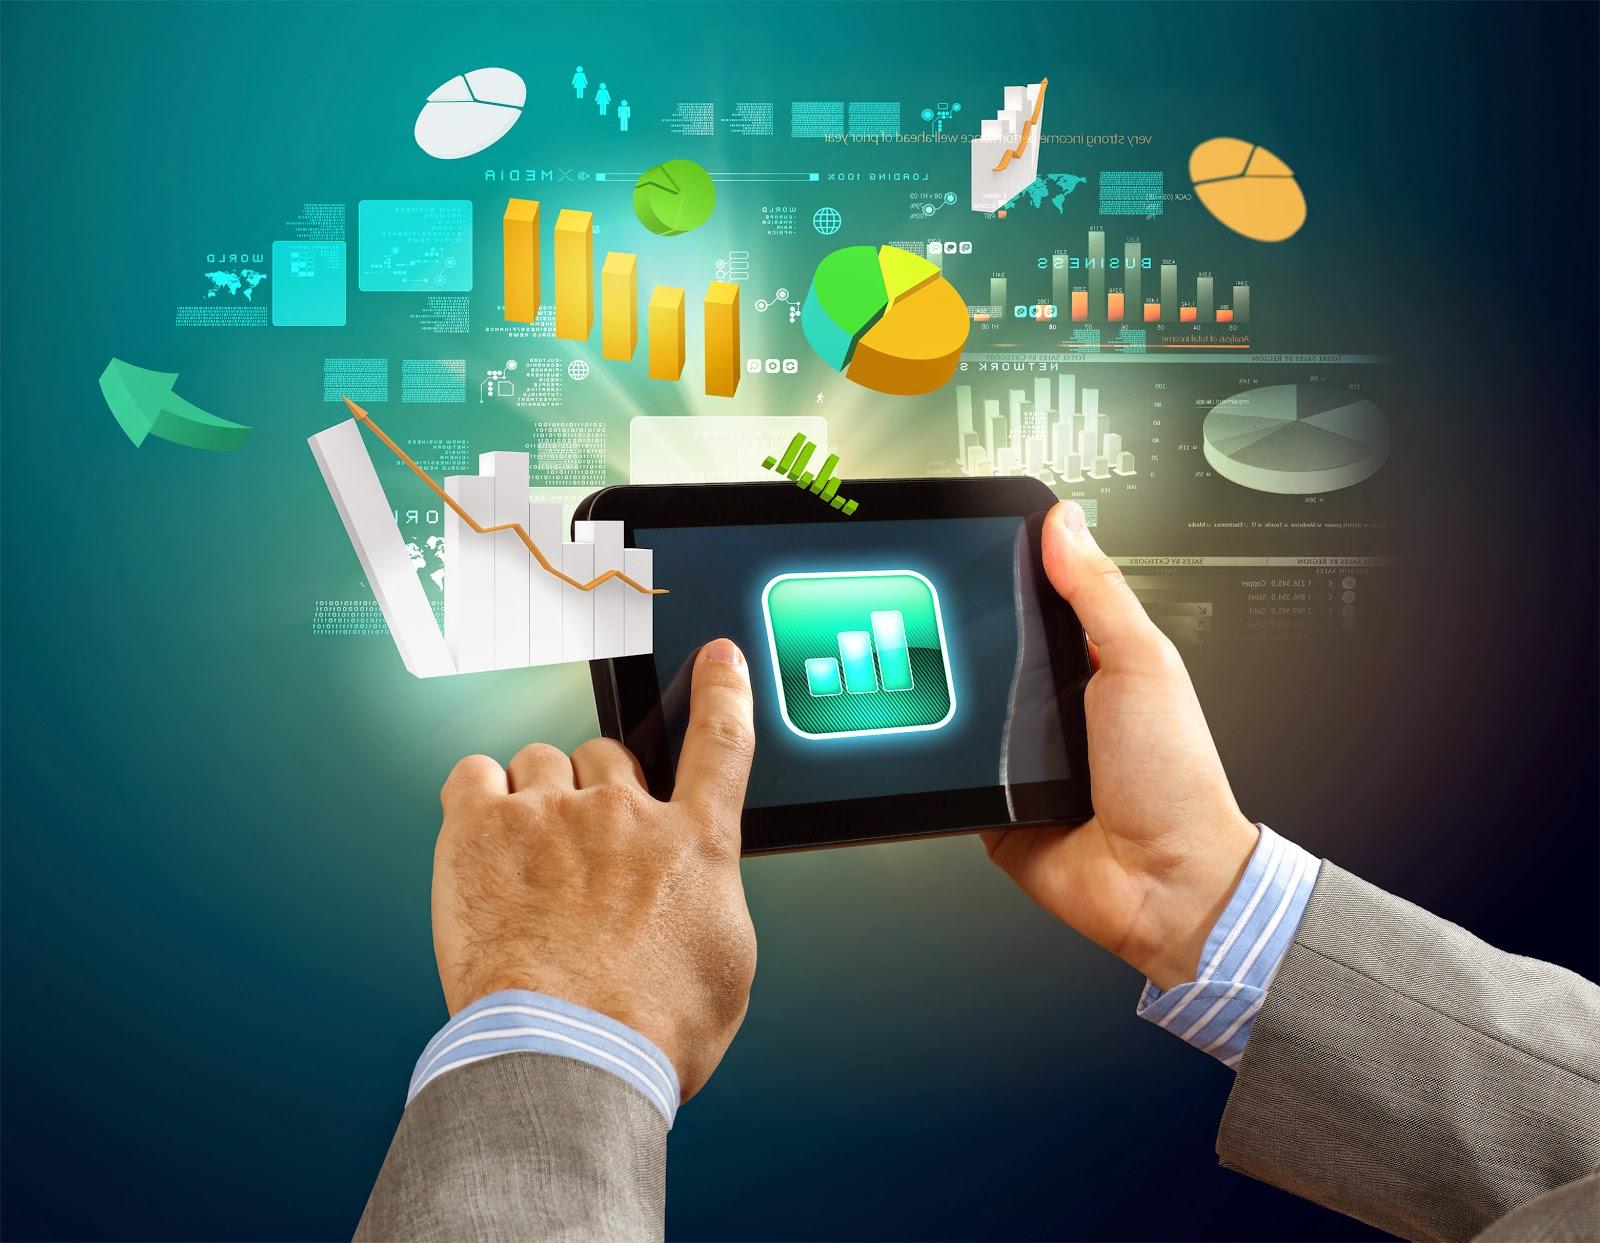 Analises de um Consultor de Marketing Digital